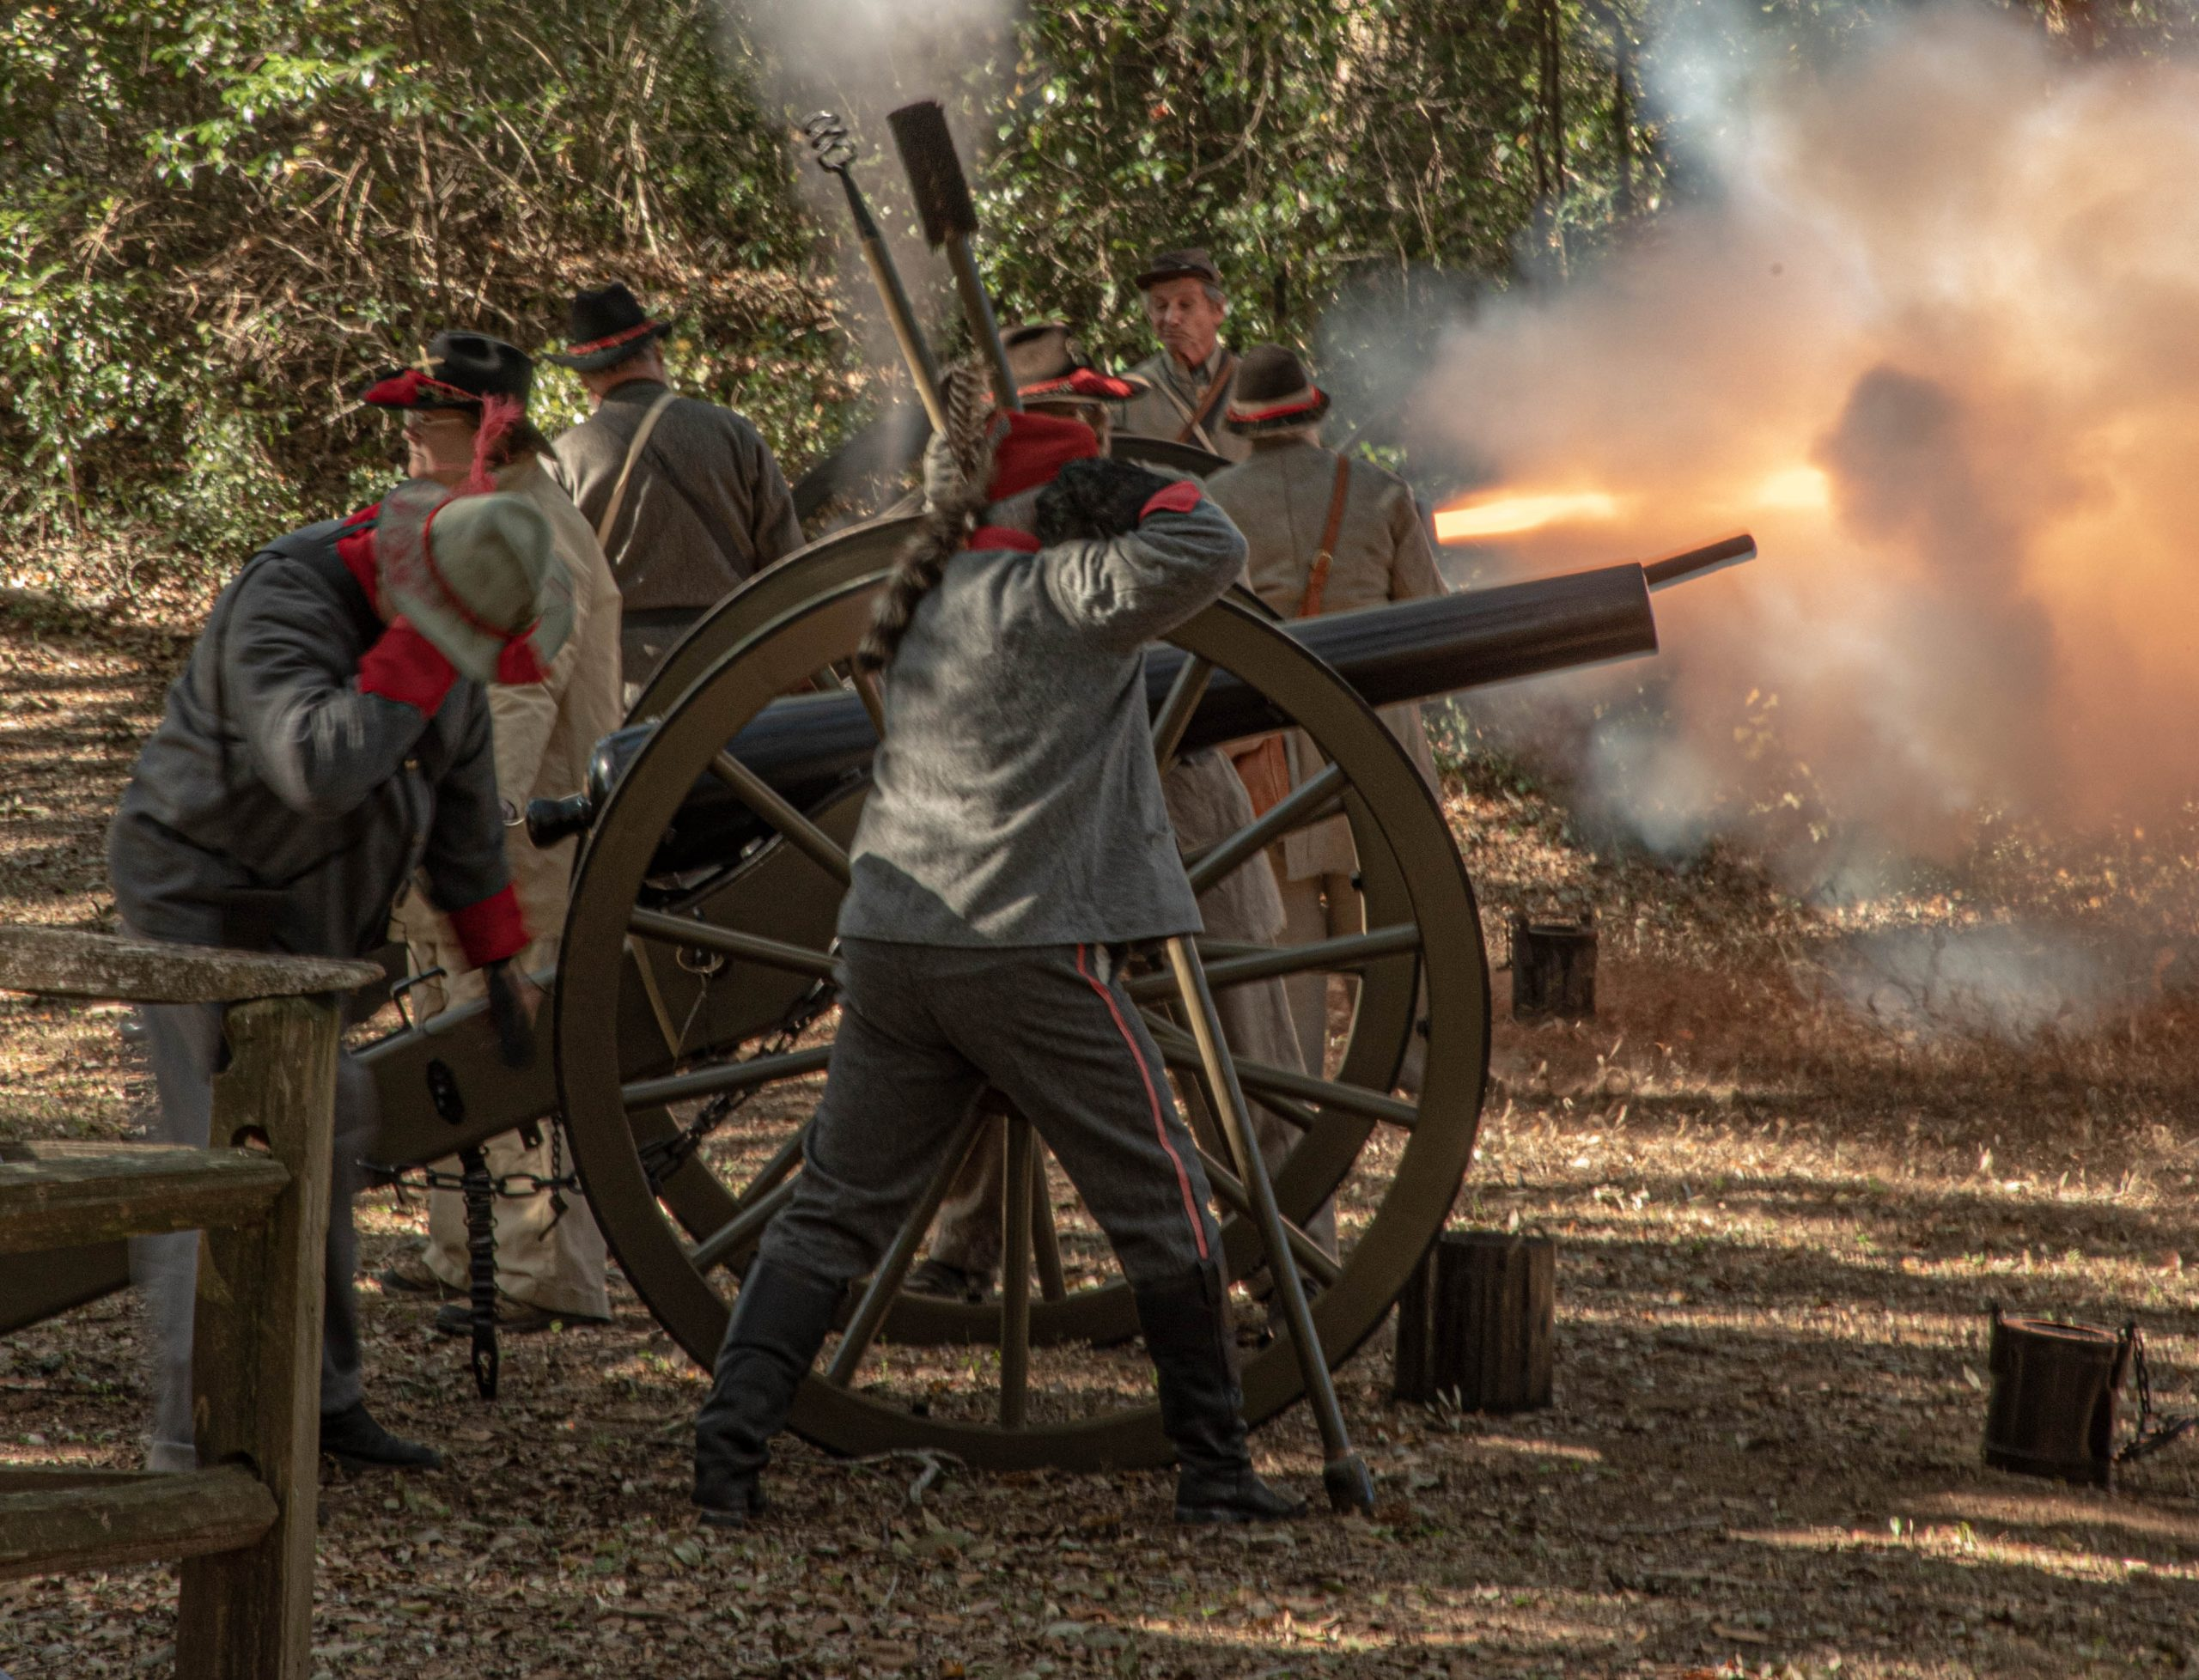 Sons of Confederate Veterans C.S.A. South Carolina 23